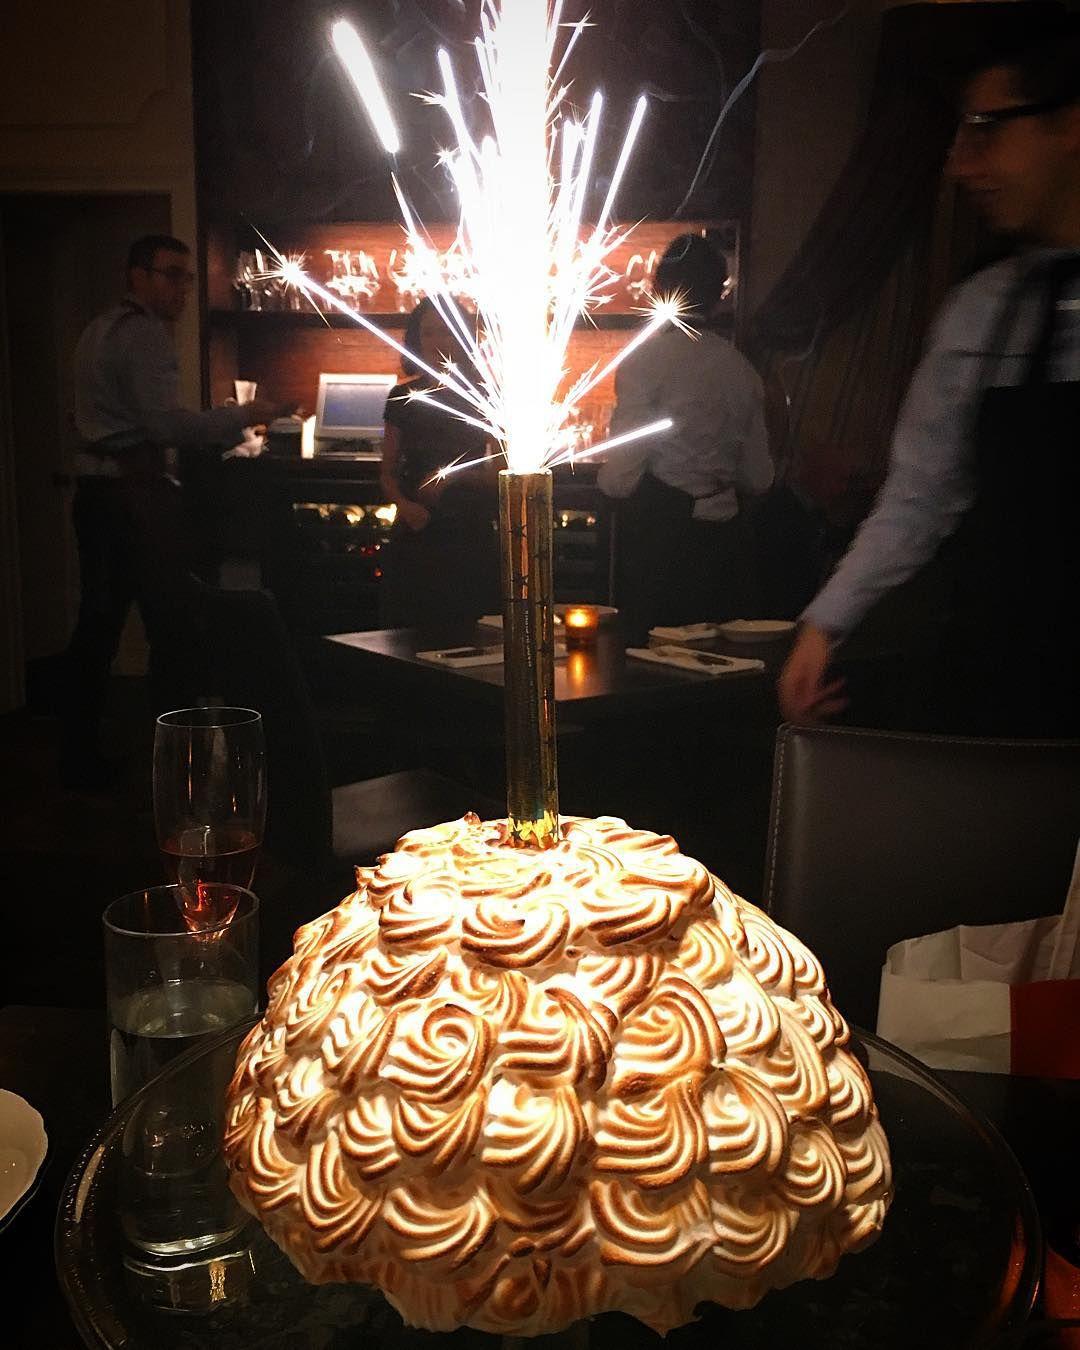 Best Group Birthday Dinner Restaurants In Nyc 2017 Tasting Table Dinner Restaurants Birthday Dinners Halloween Dinner